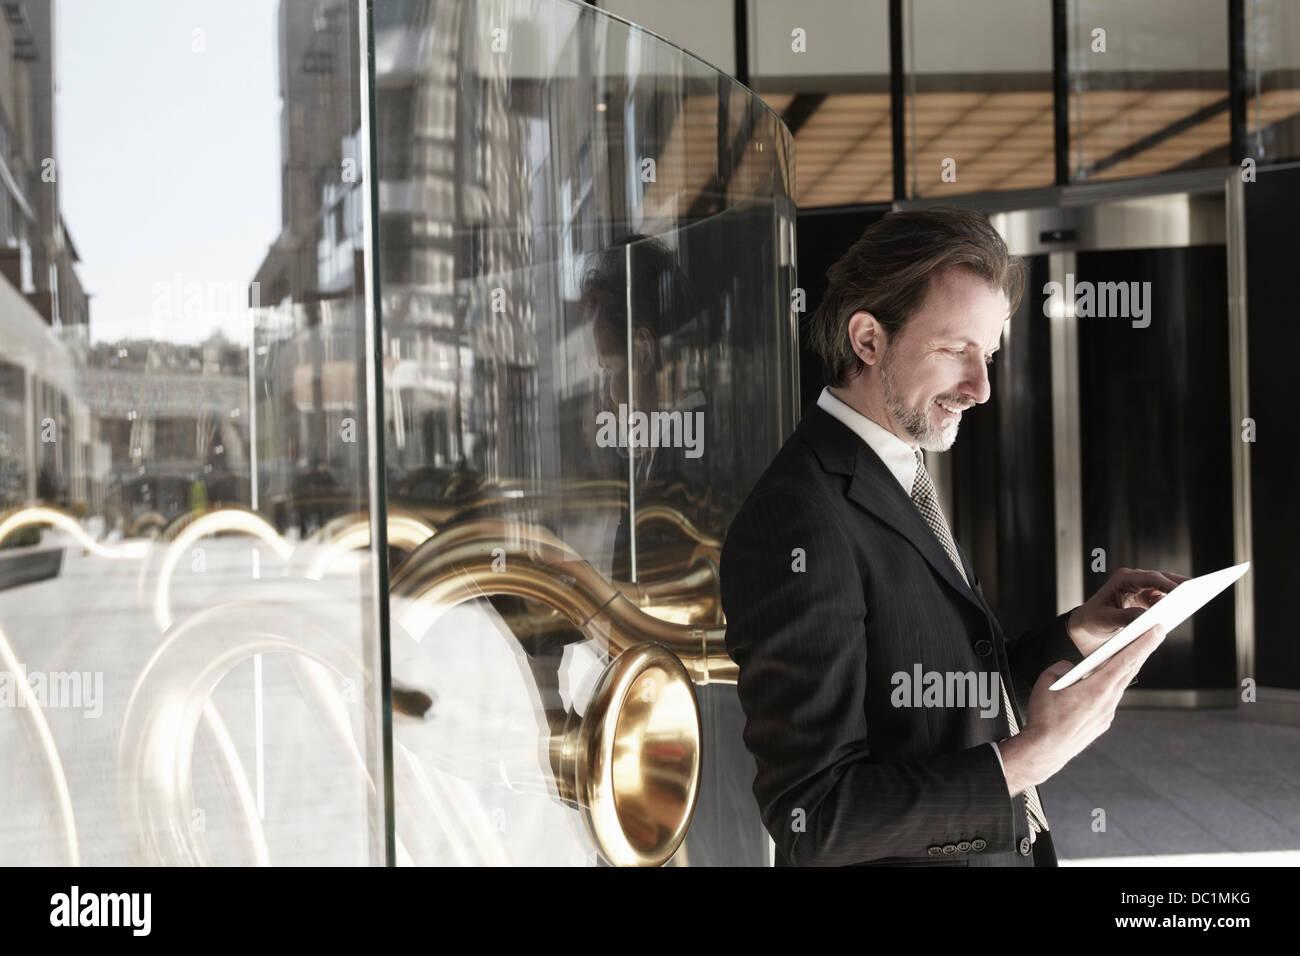 Mid adult businessman leaning against store fenêtre et using digital tablet Photo Stock